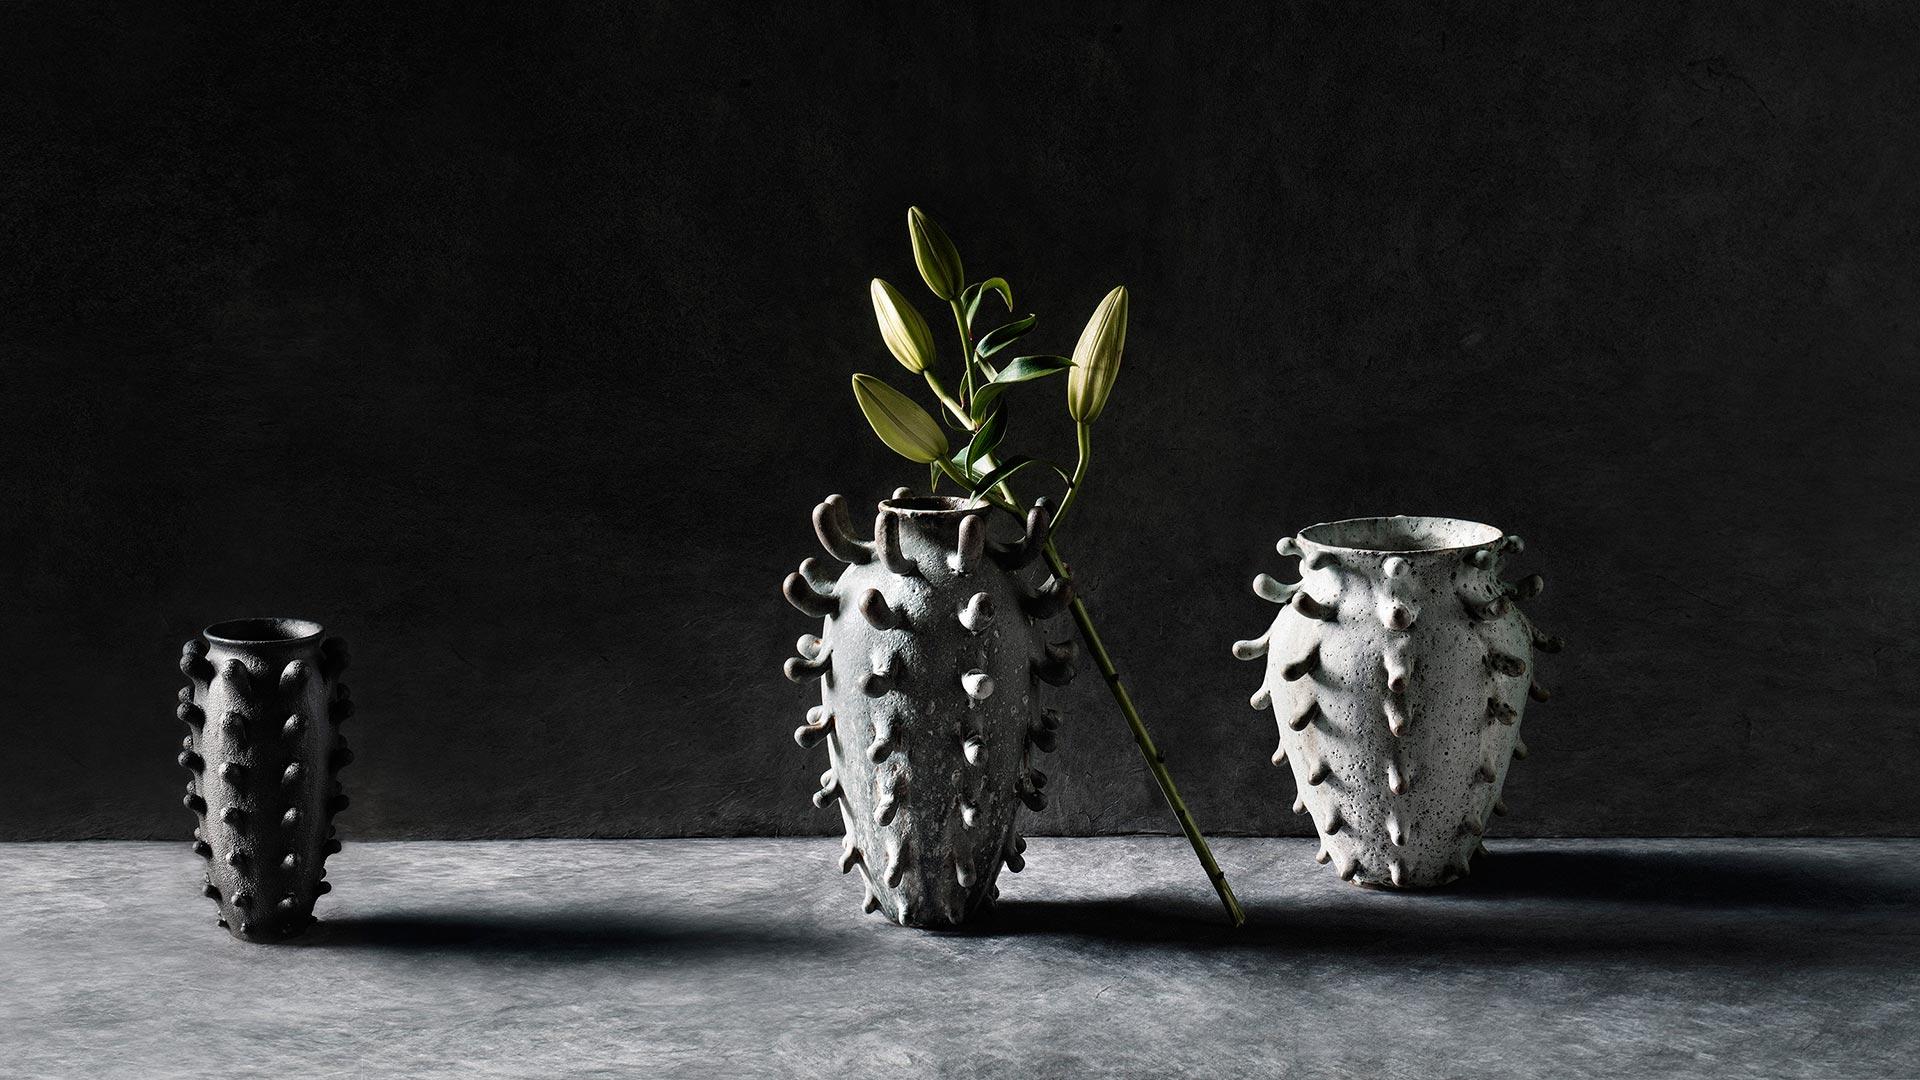 Granite-Sprouting-Vase-Black-Studded-Vessel-Crater-Vase-2018-1920-x-1080-smaller.jpg